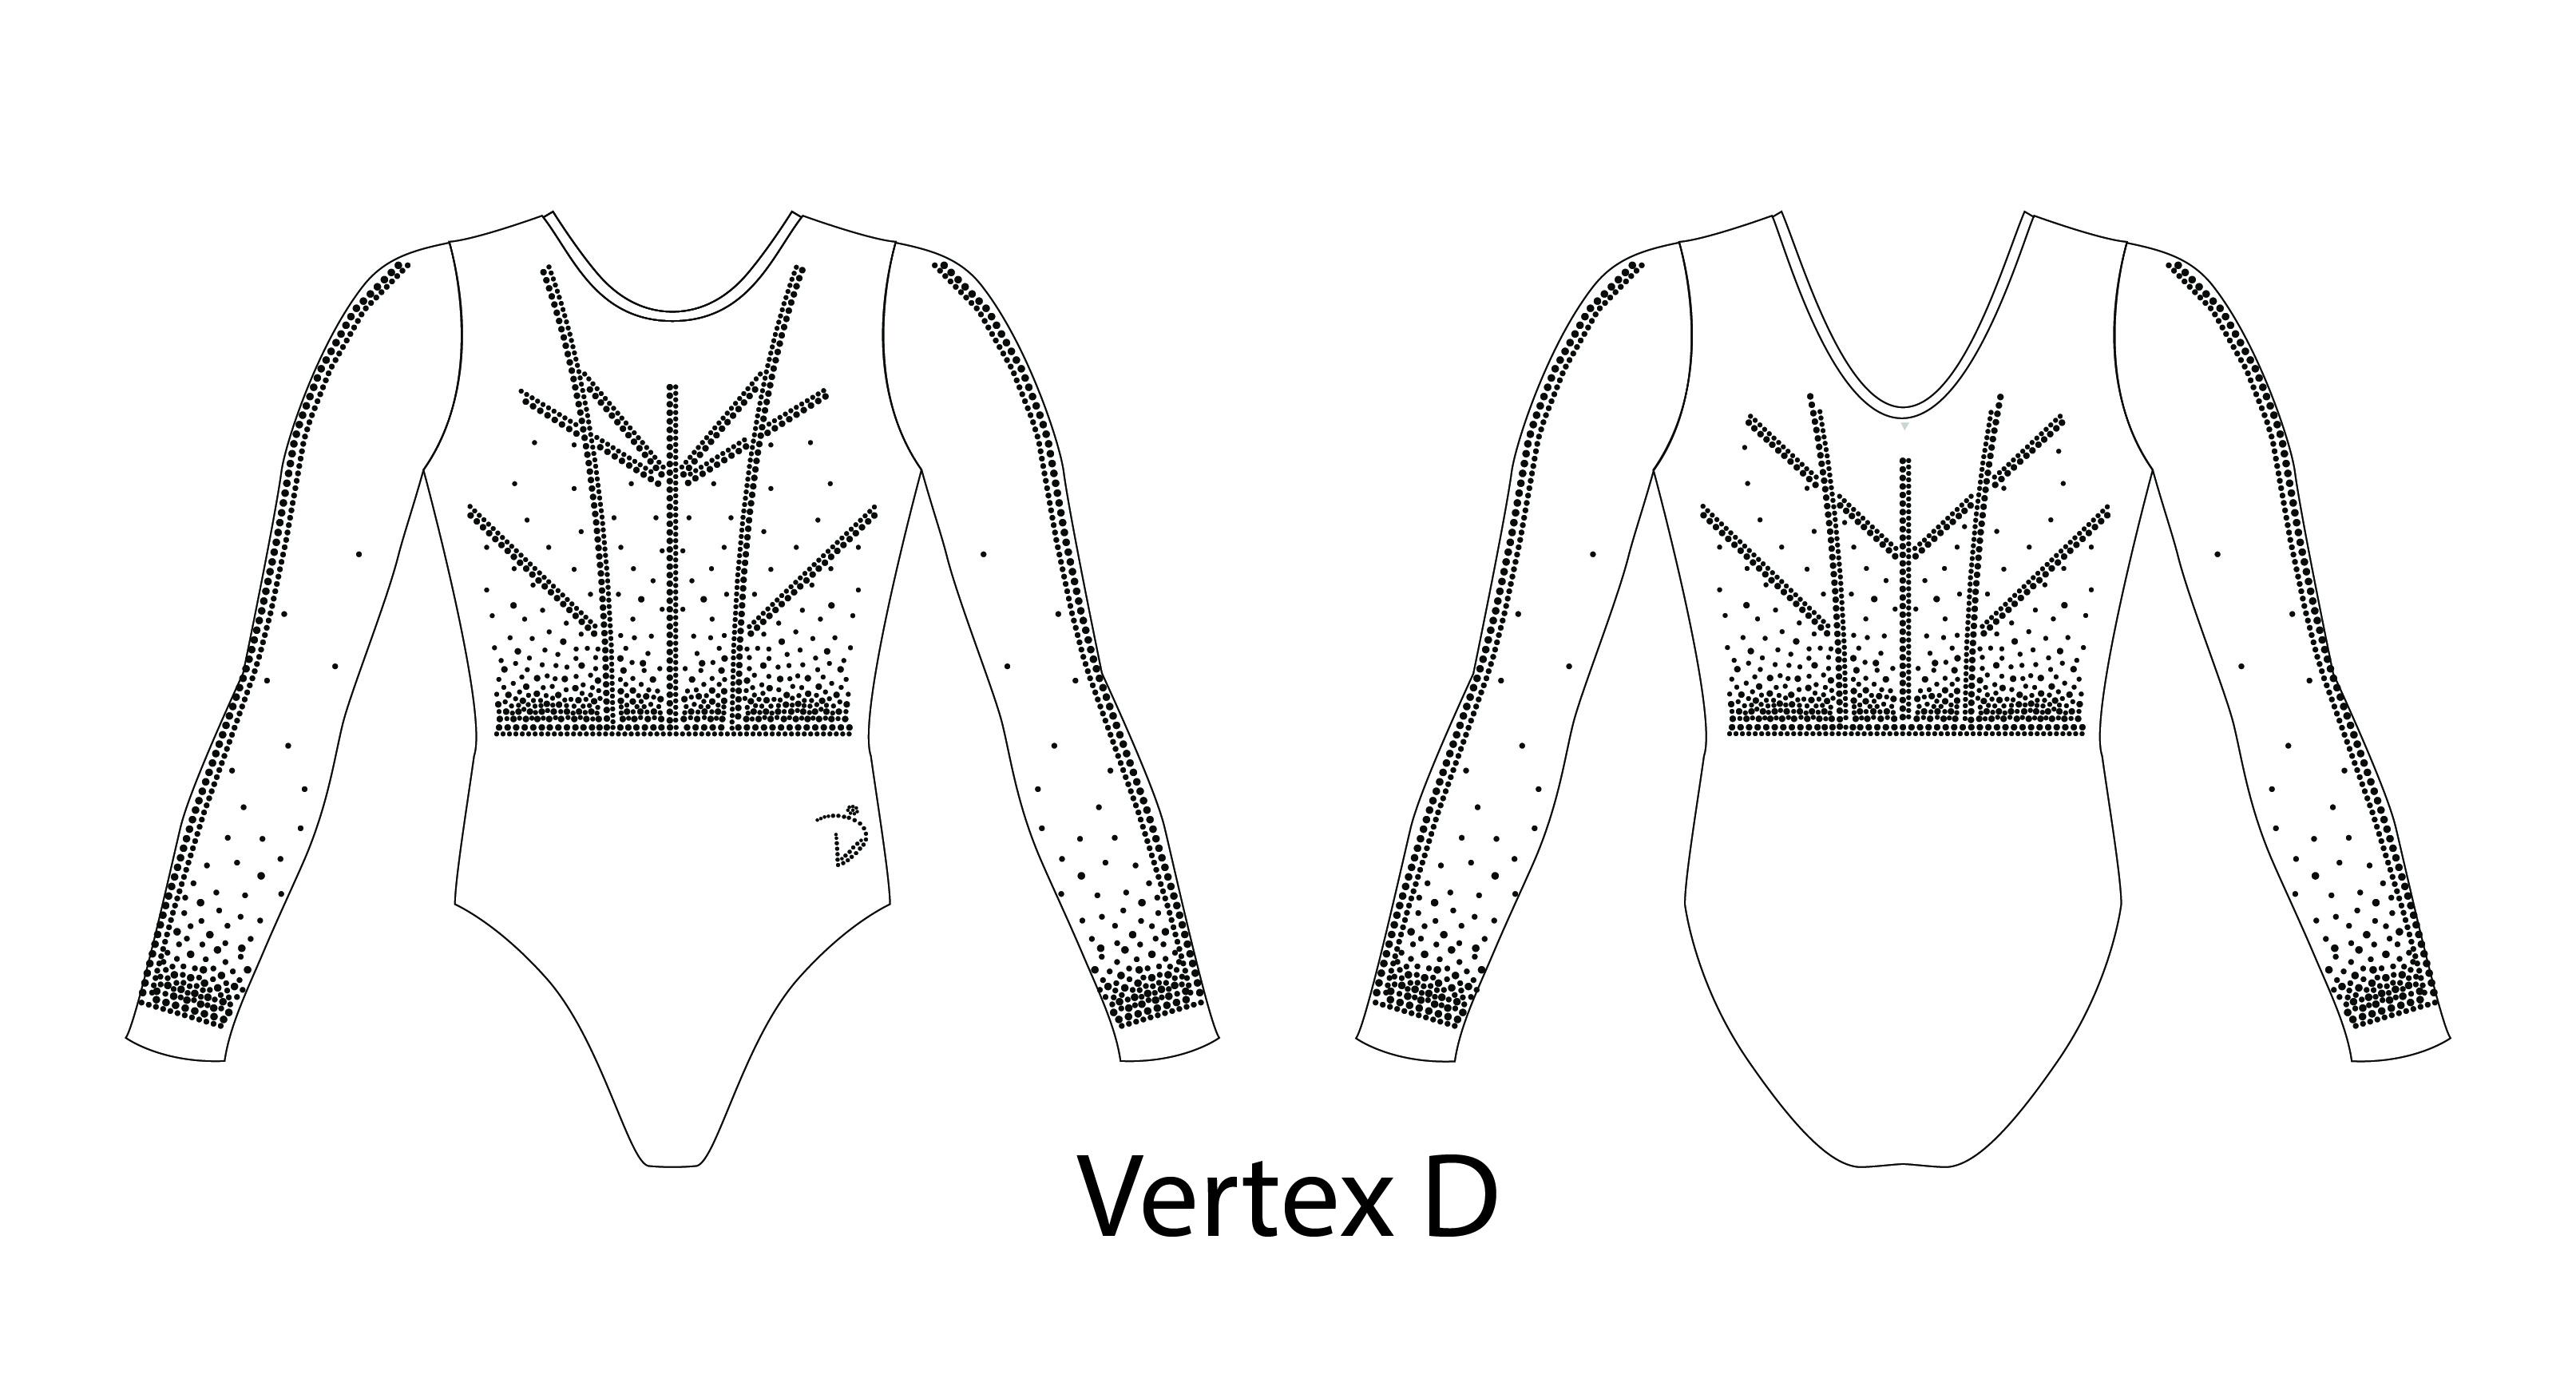 Vertex D